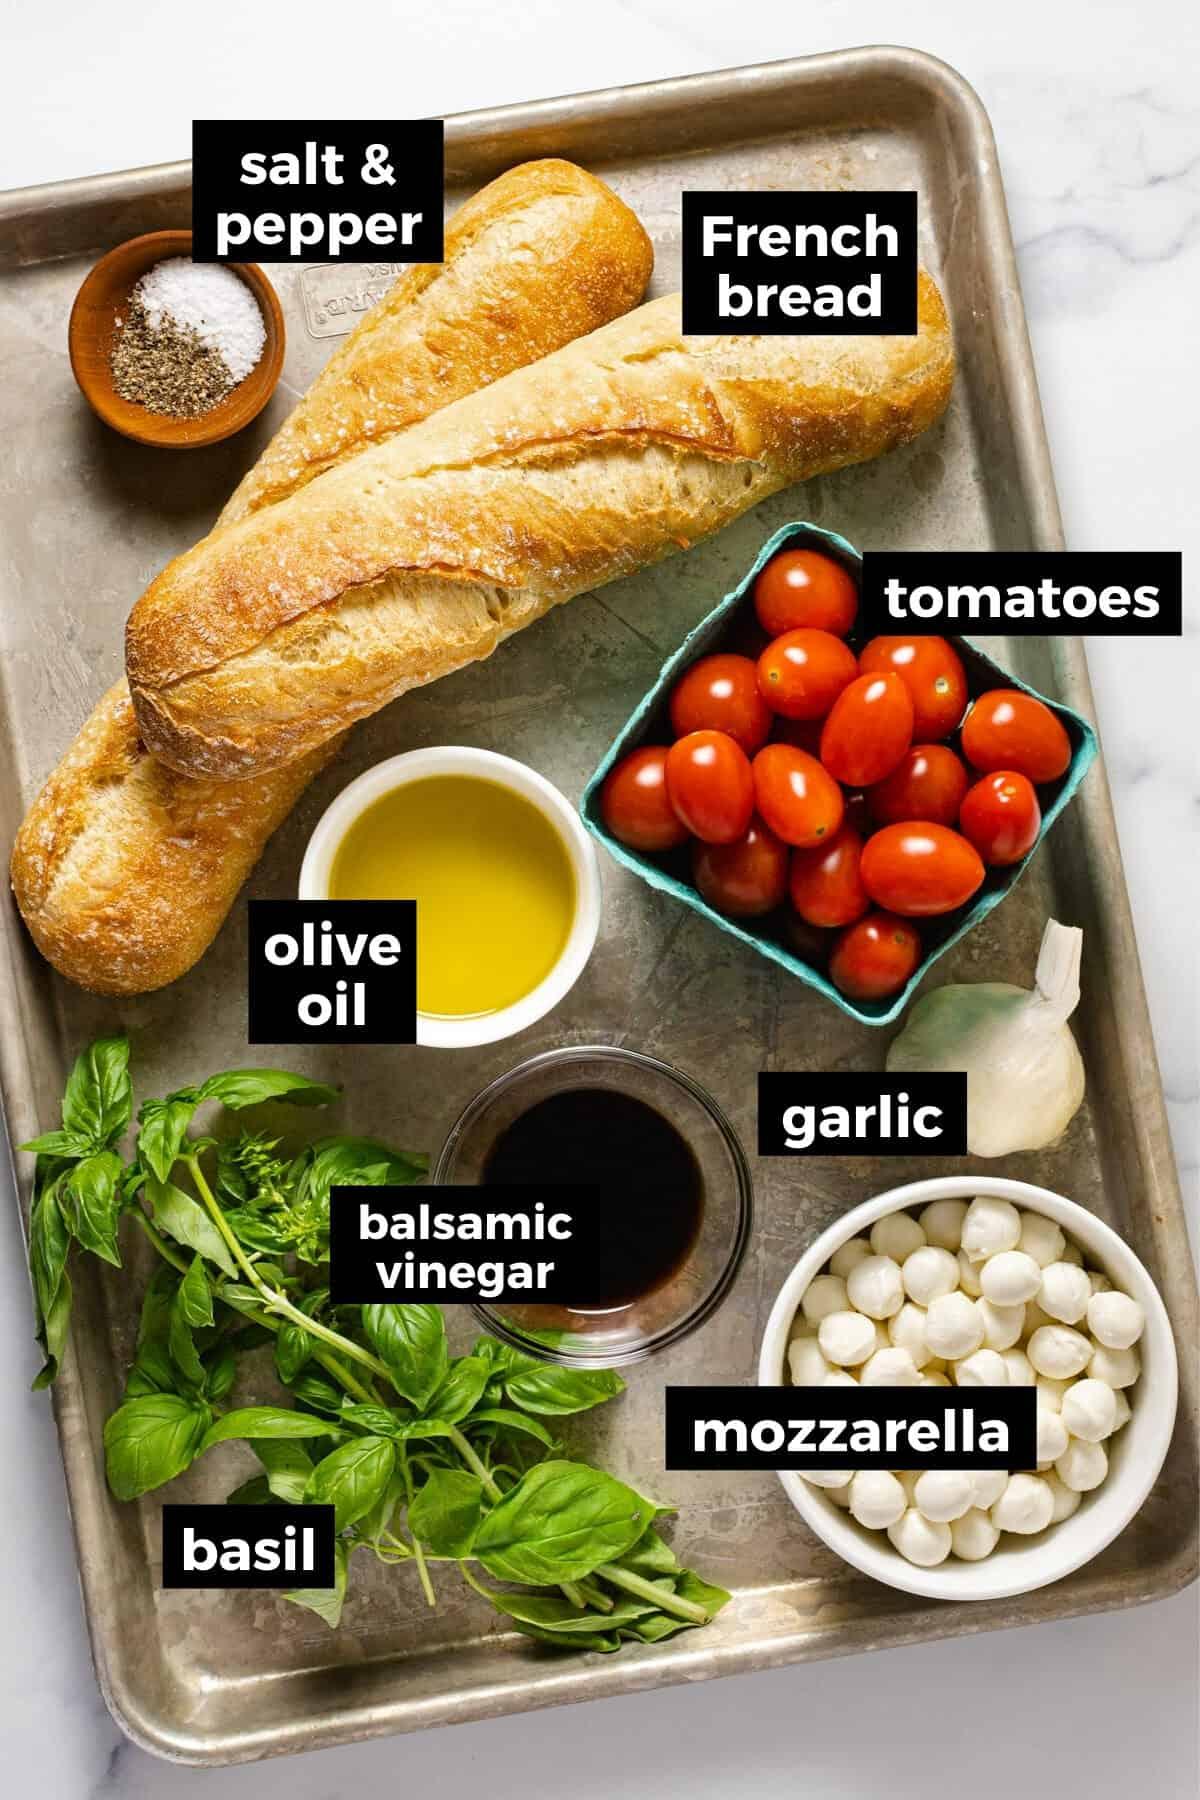 Metal sheet pan with ingredients to make bruschetta with mozzarella